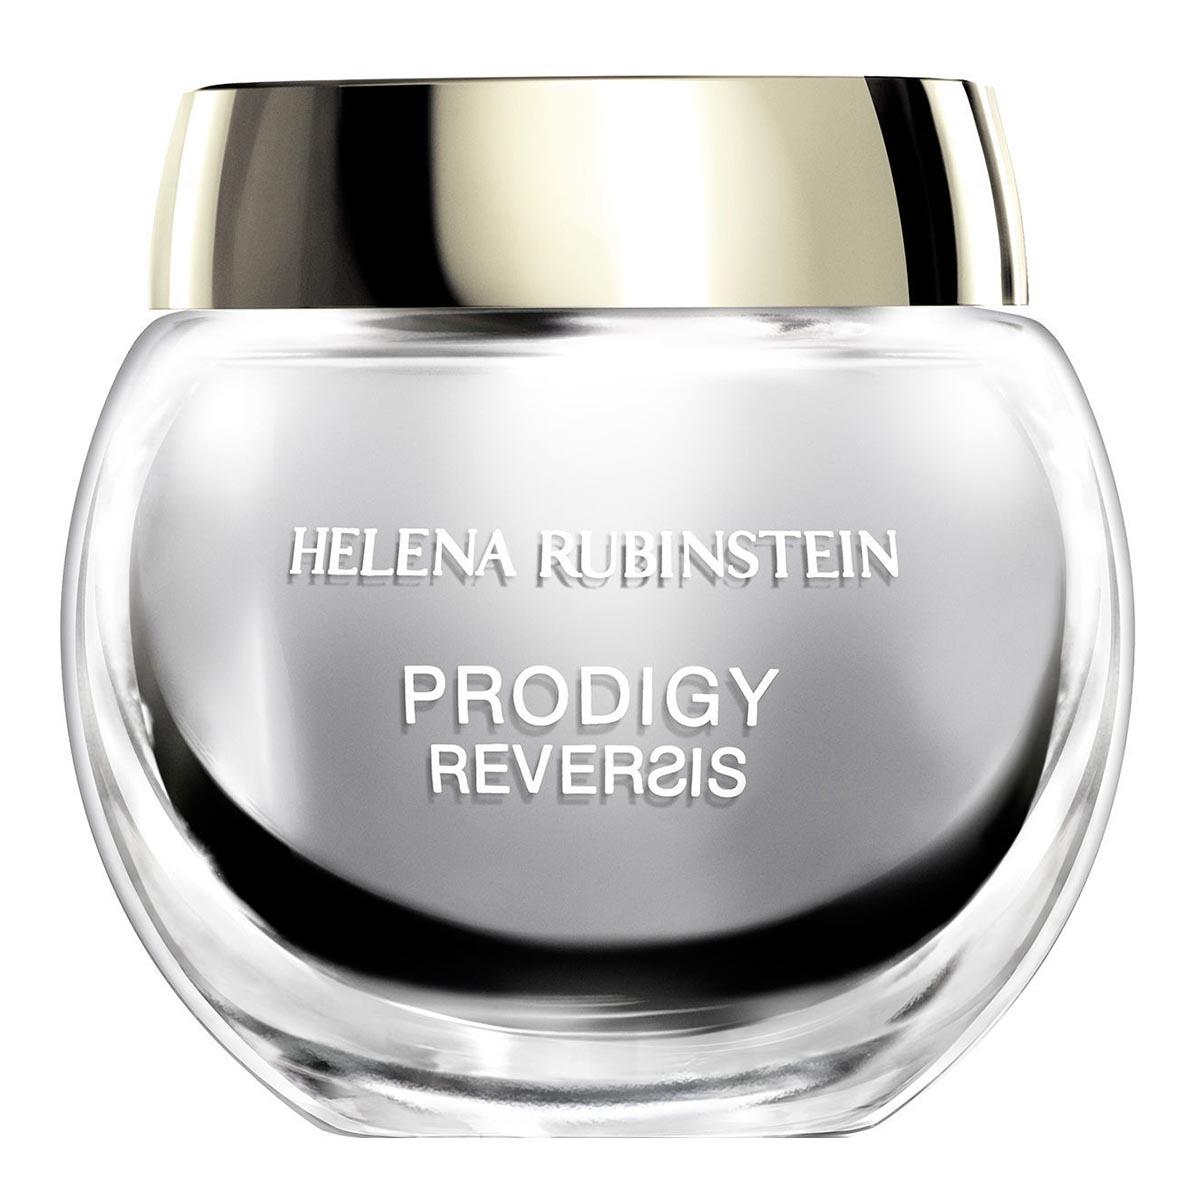 Helena rubinstein prodigy reversis piel seca cream 50ml